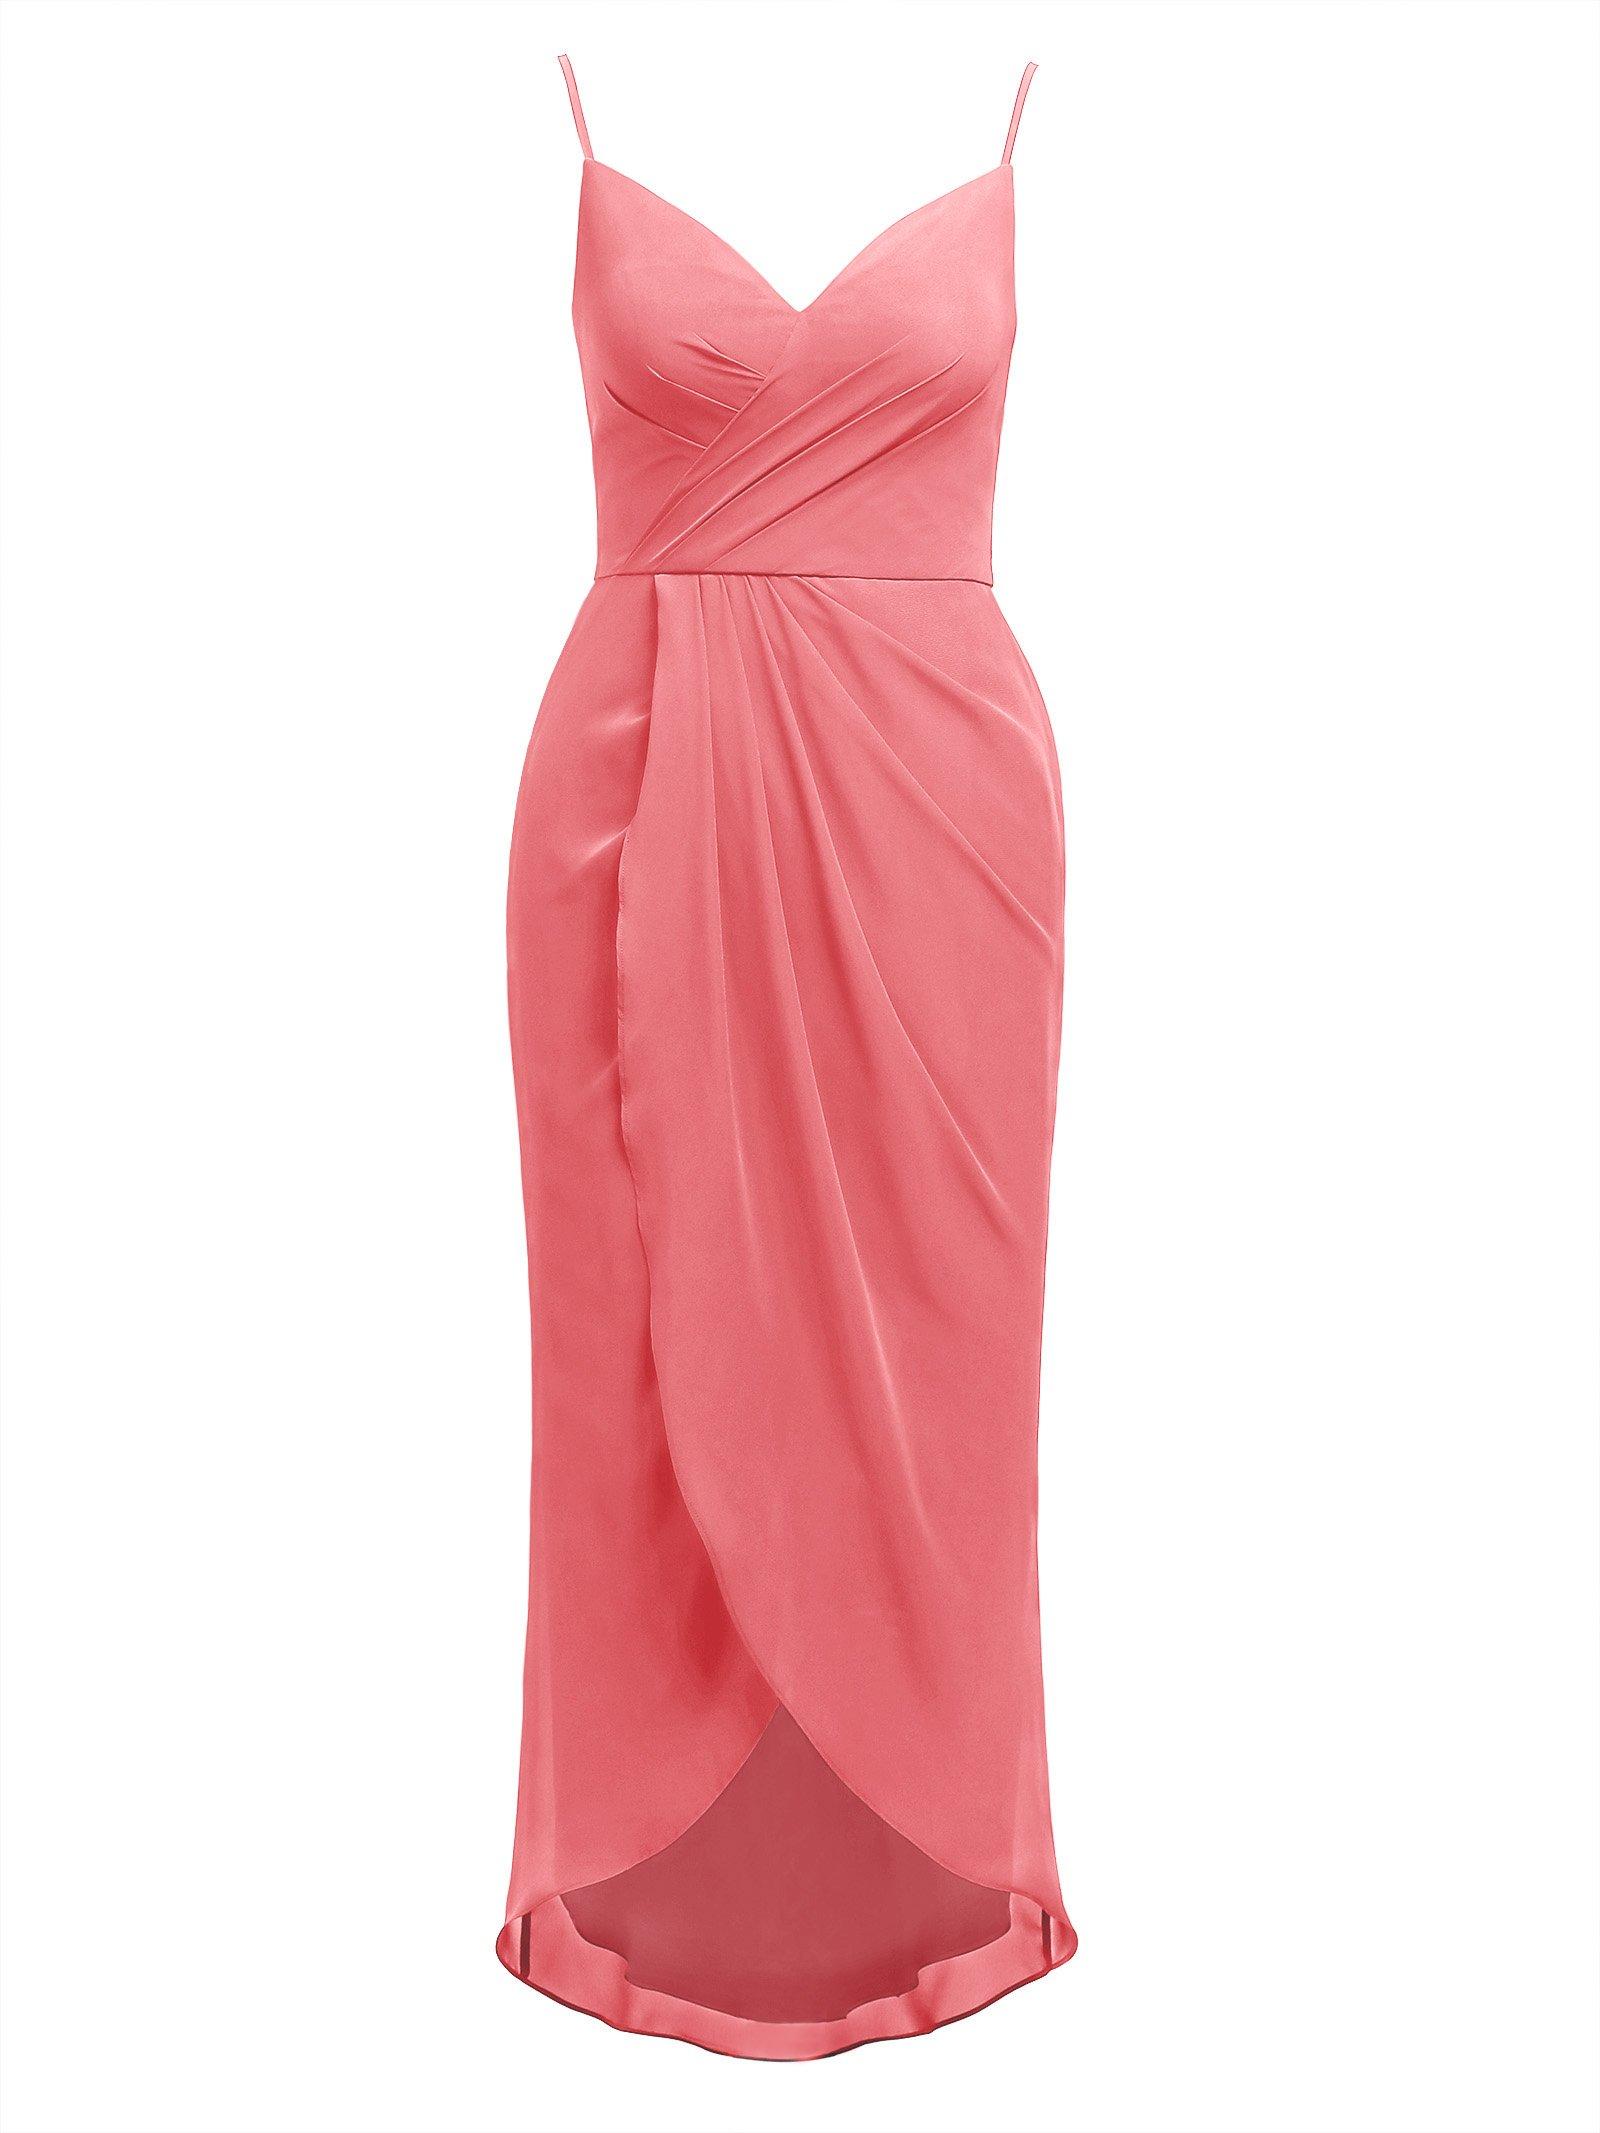 Alicepub Hi-Lo Chiffon Bridesmaid Dress Womens Spaghetti Bridal Party Evening Gown